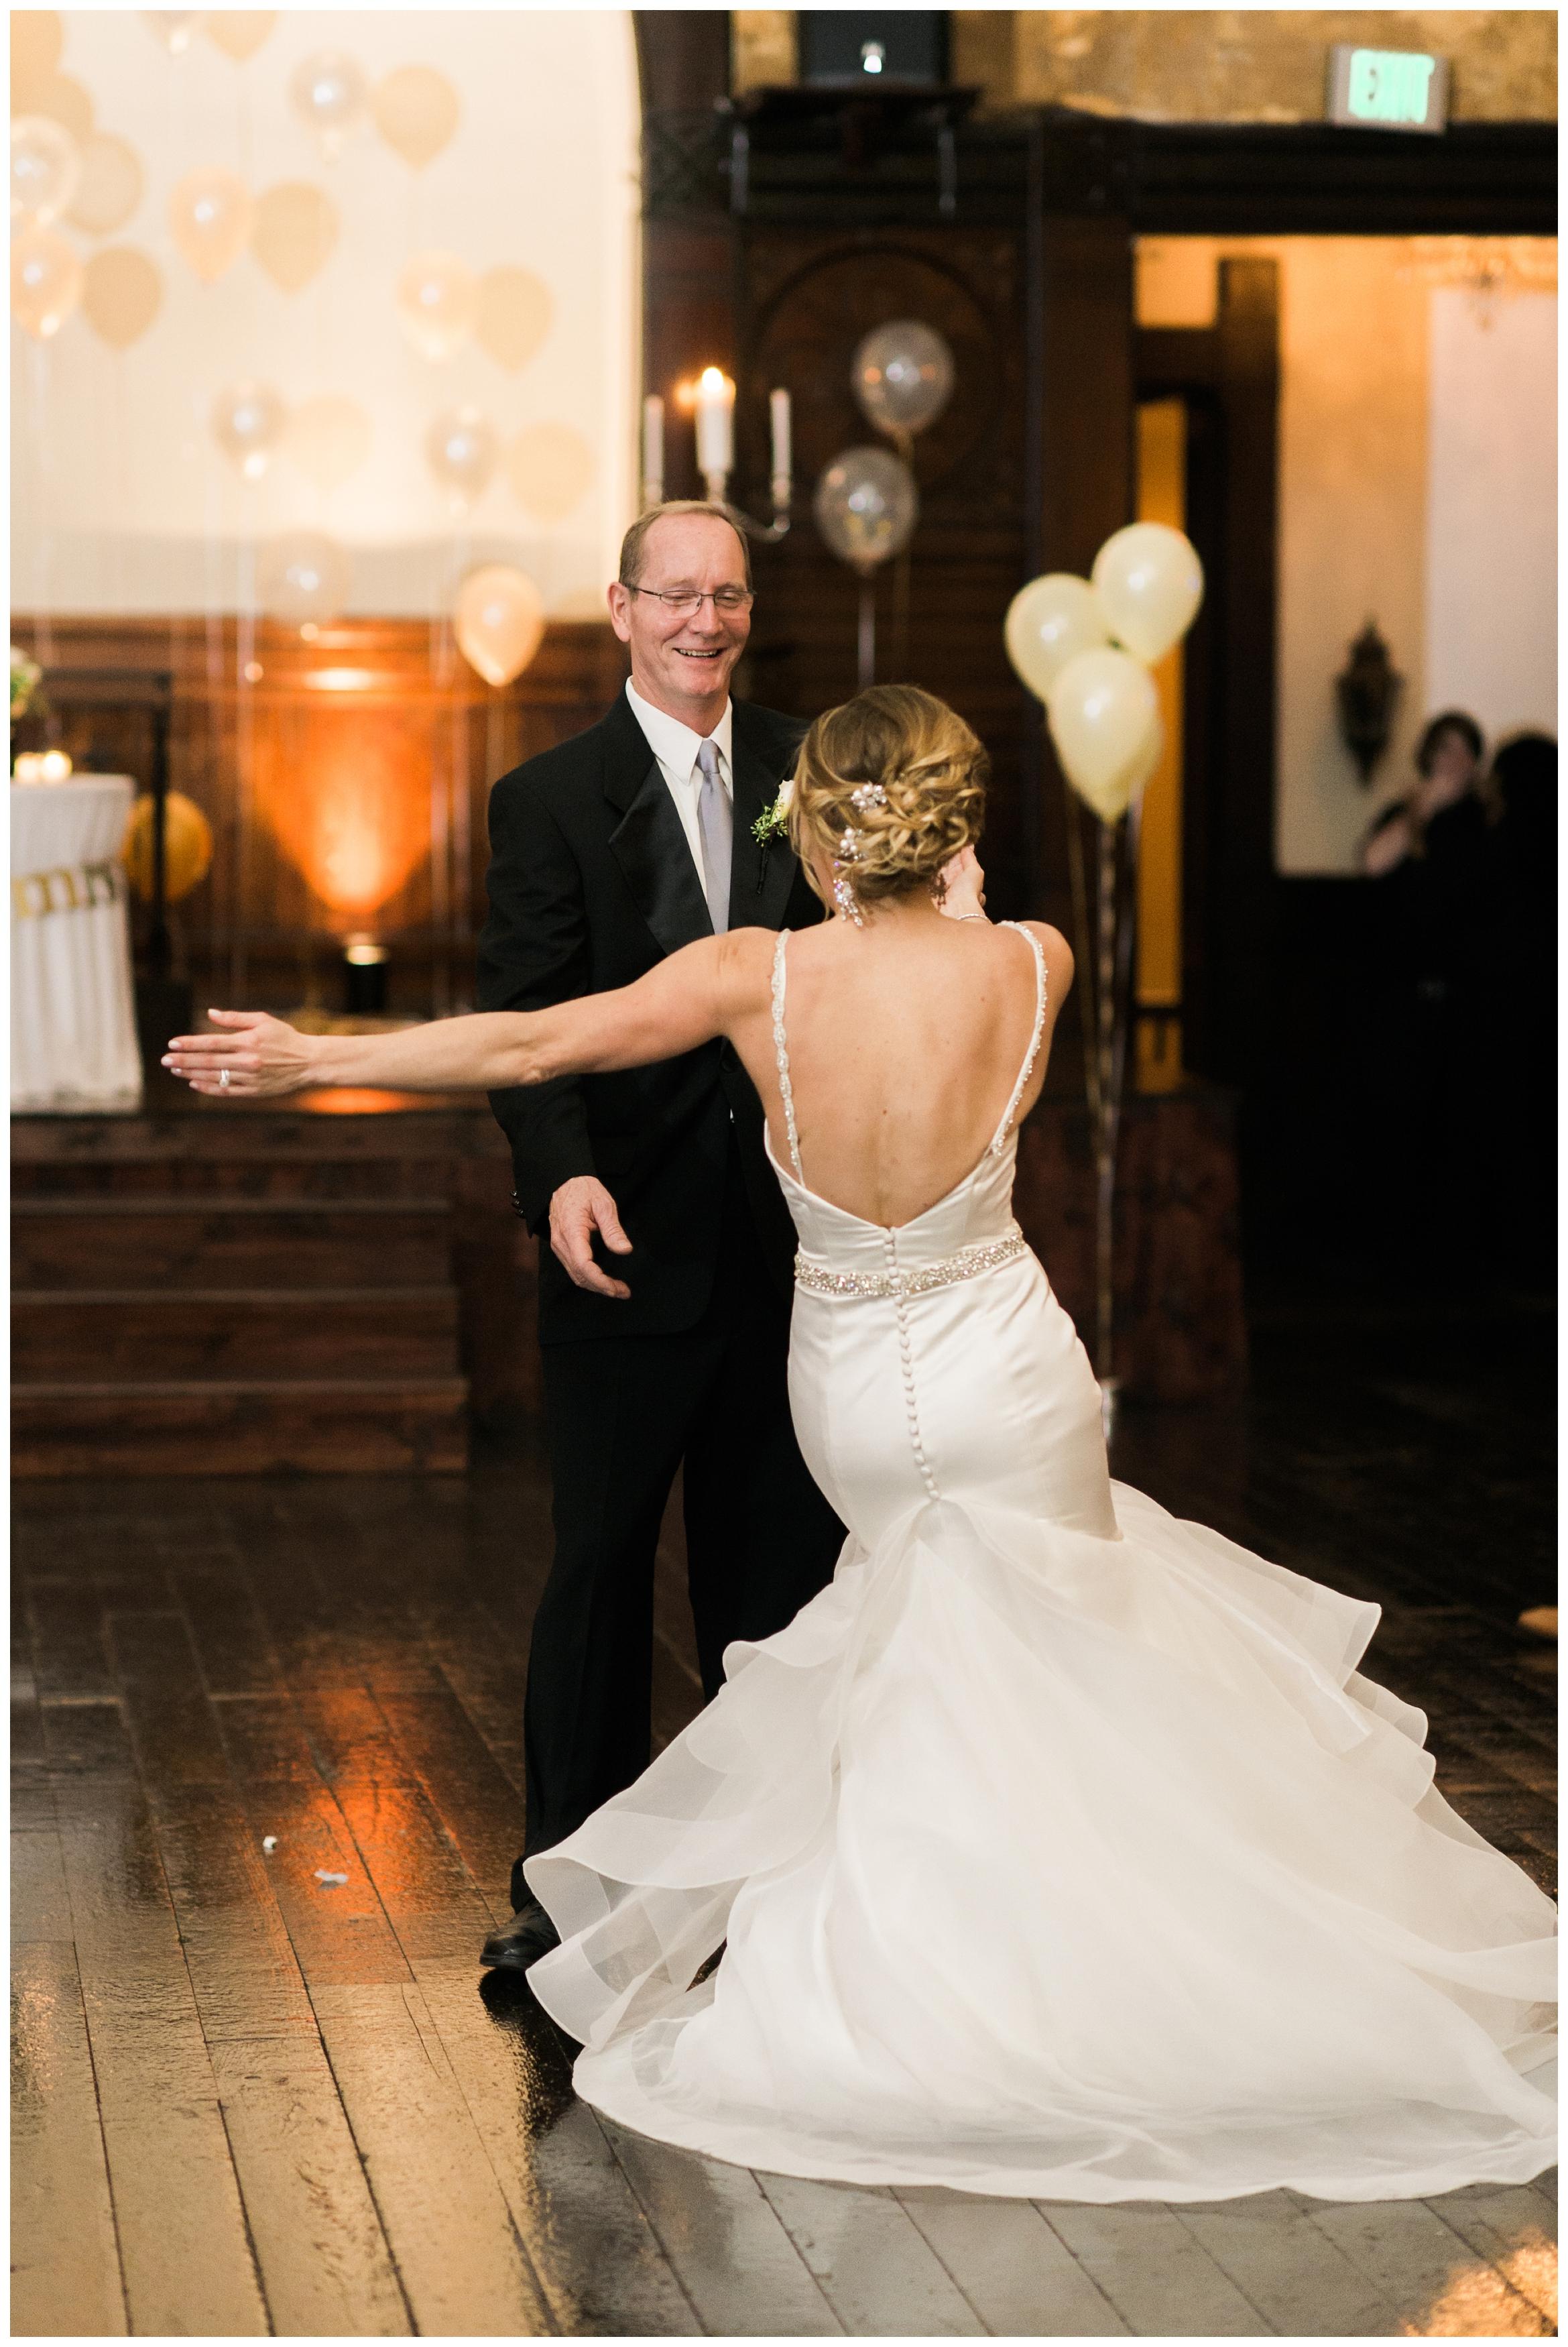 Rebecca_Bridges_Photography_Indianapolis_Wedding_Photographer_5852.jpg